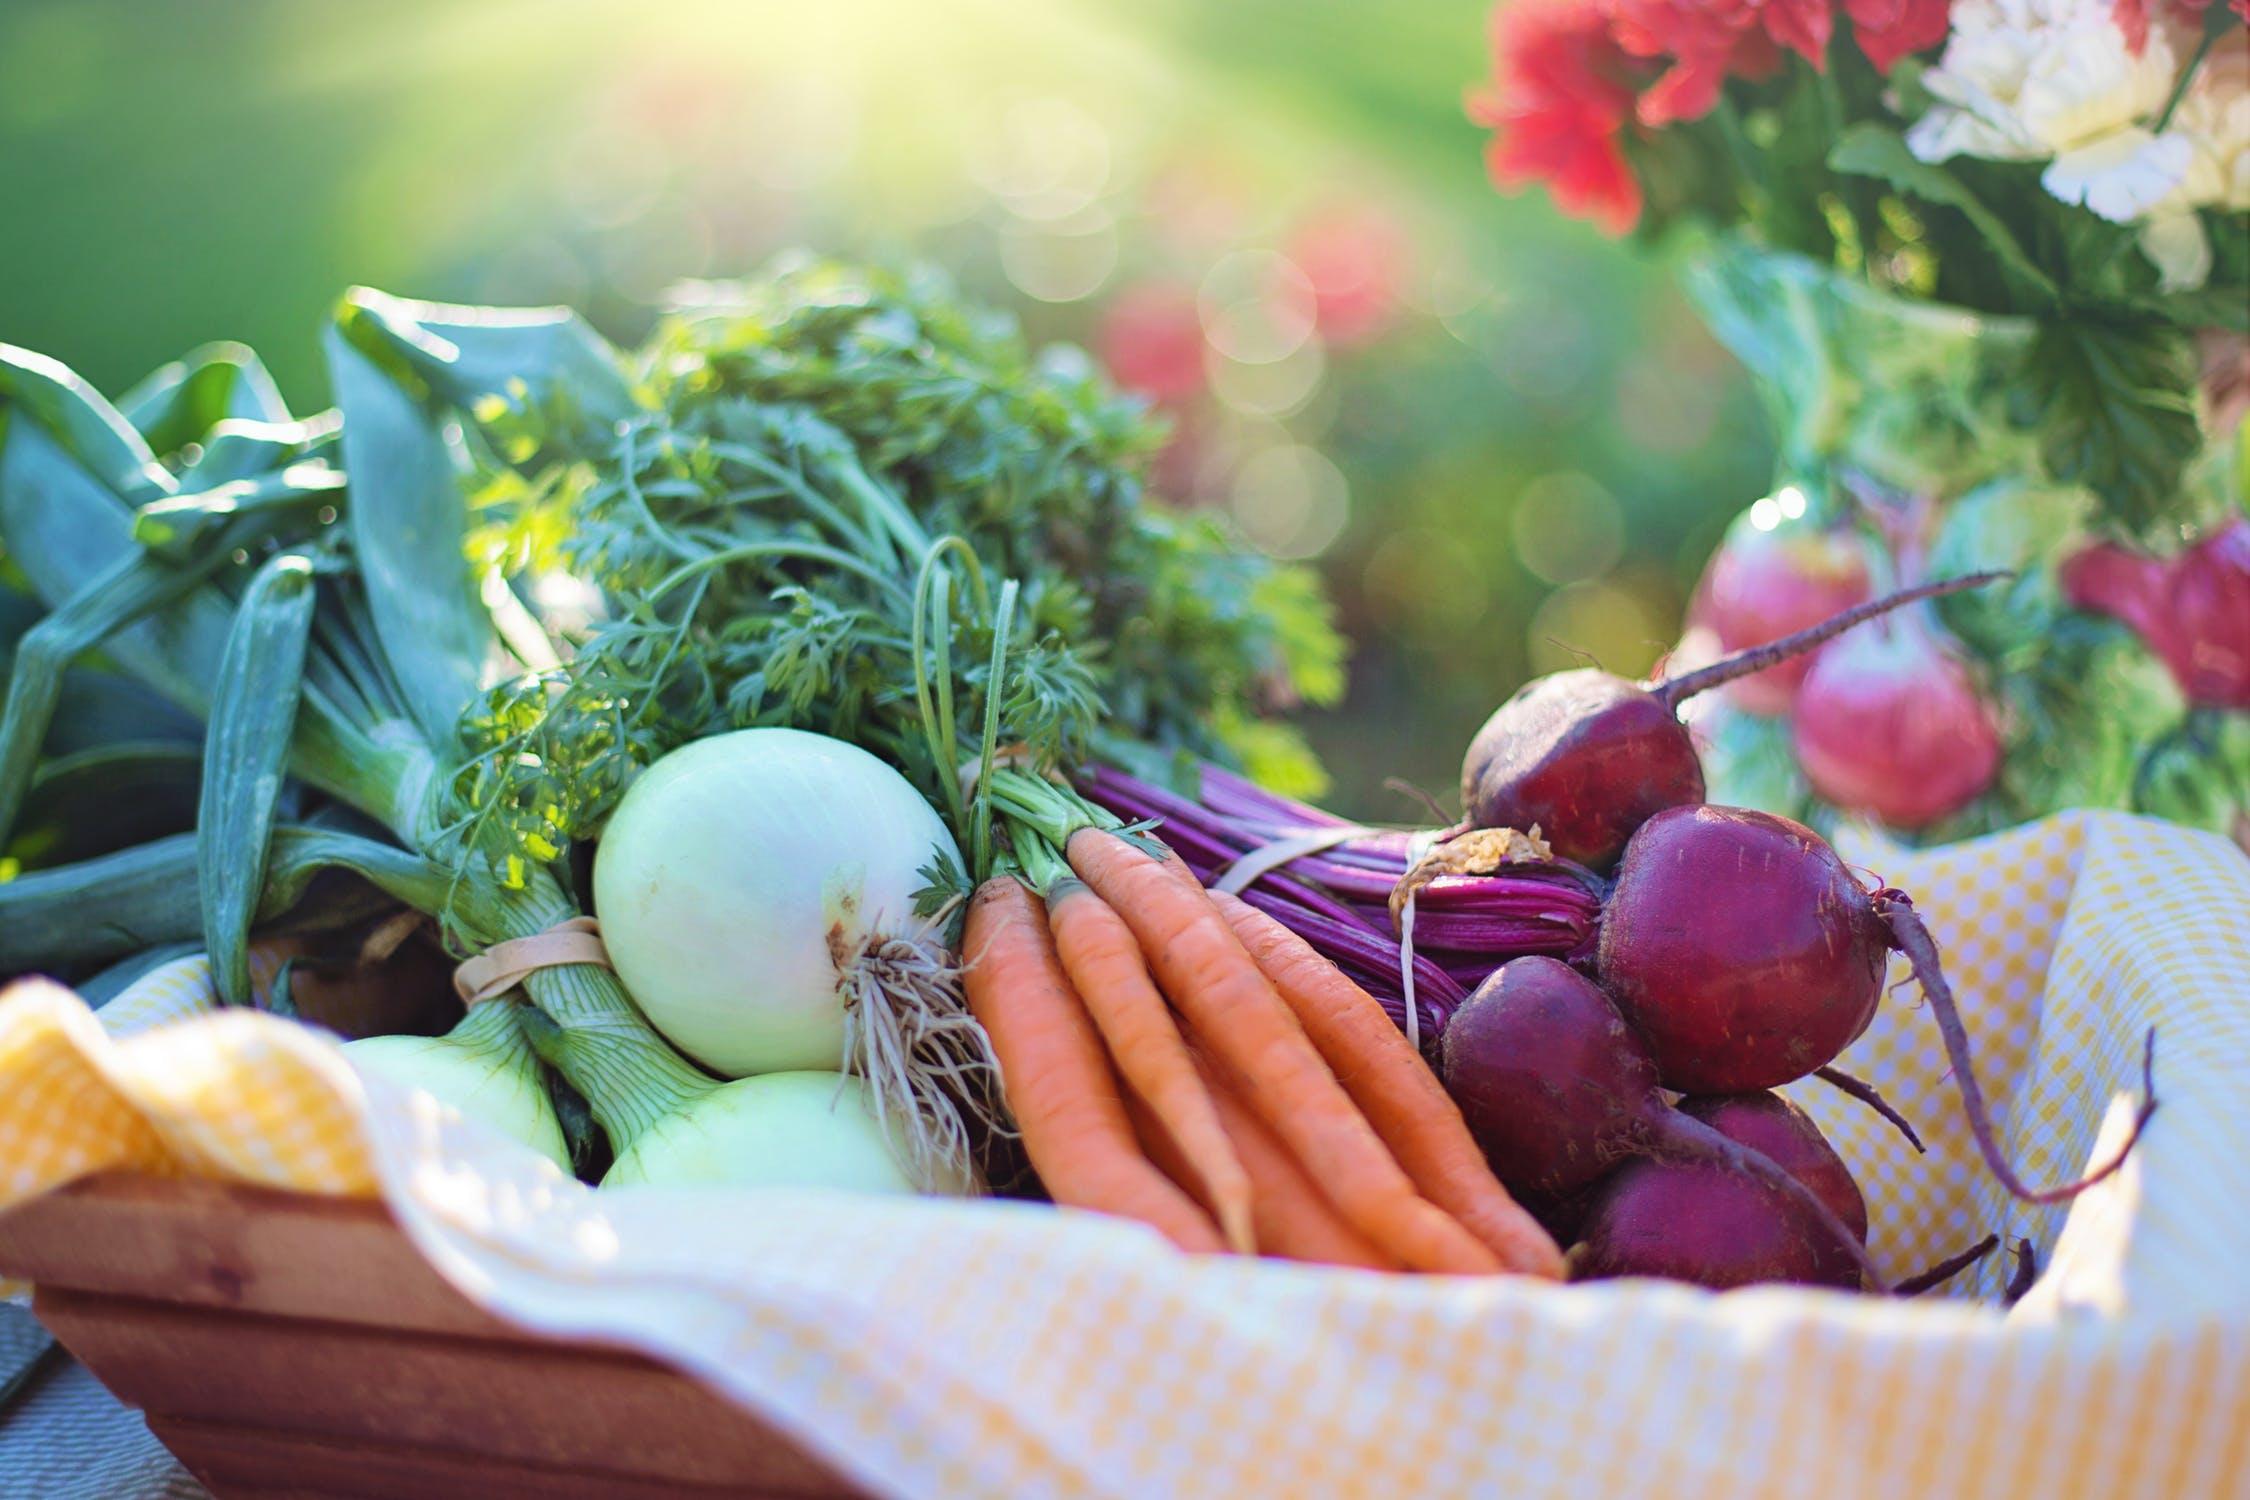 Vegetables rich in antioxidant